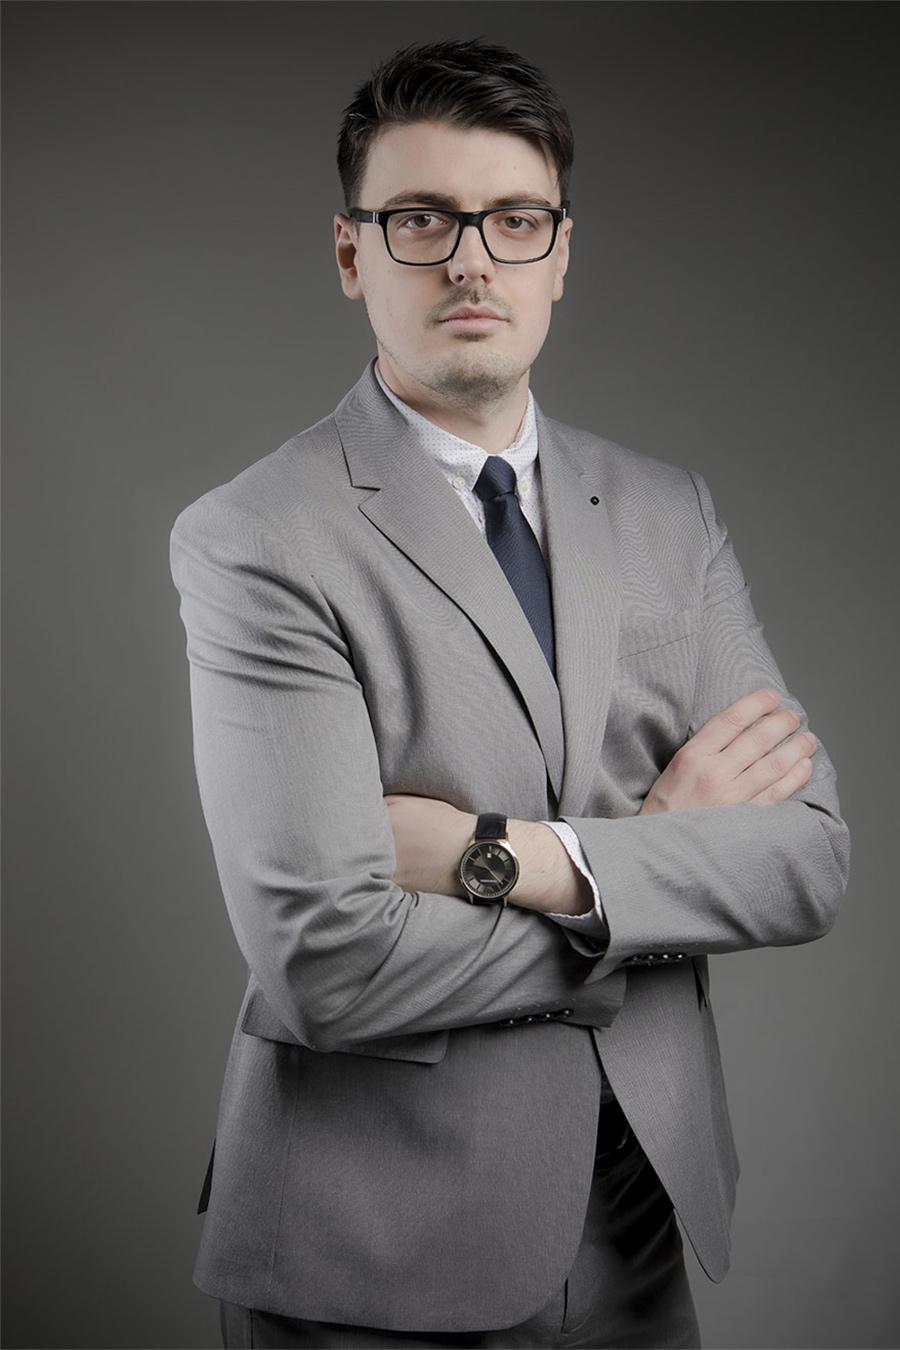 Dardan Gerxhaliu